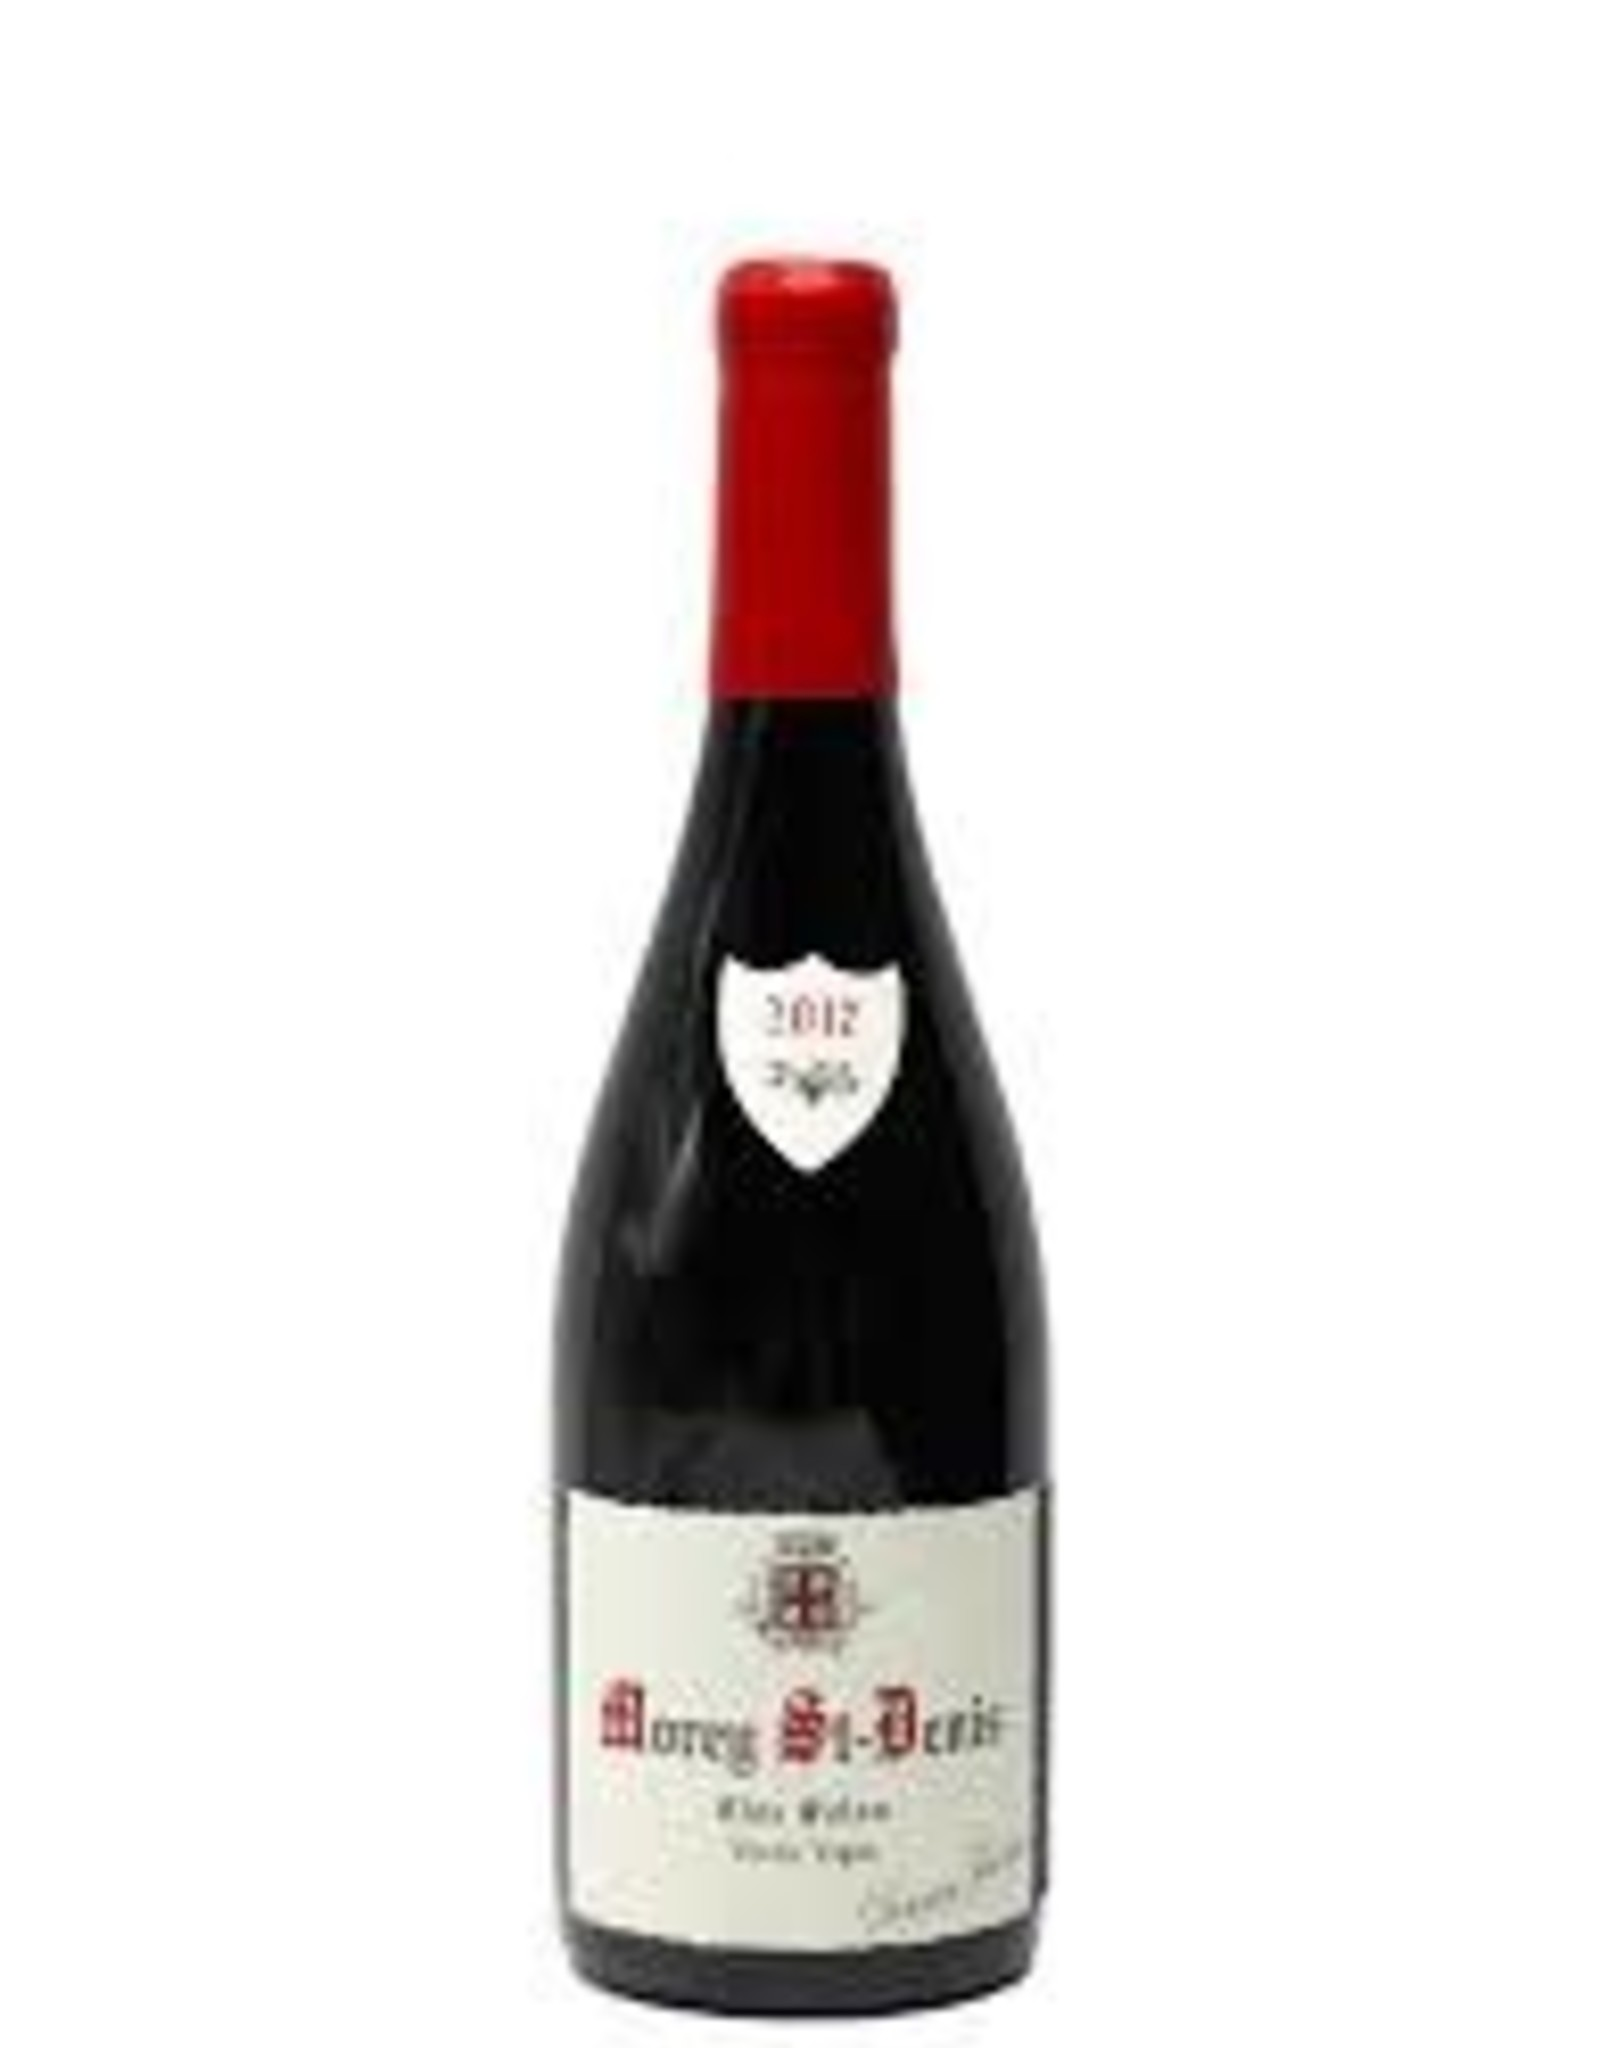 R Burgundy, Morey Saint Denis, CLOS SOLON VV, Fourrier 2017